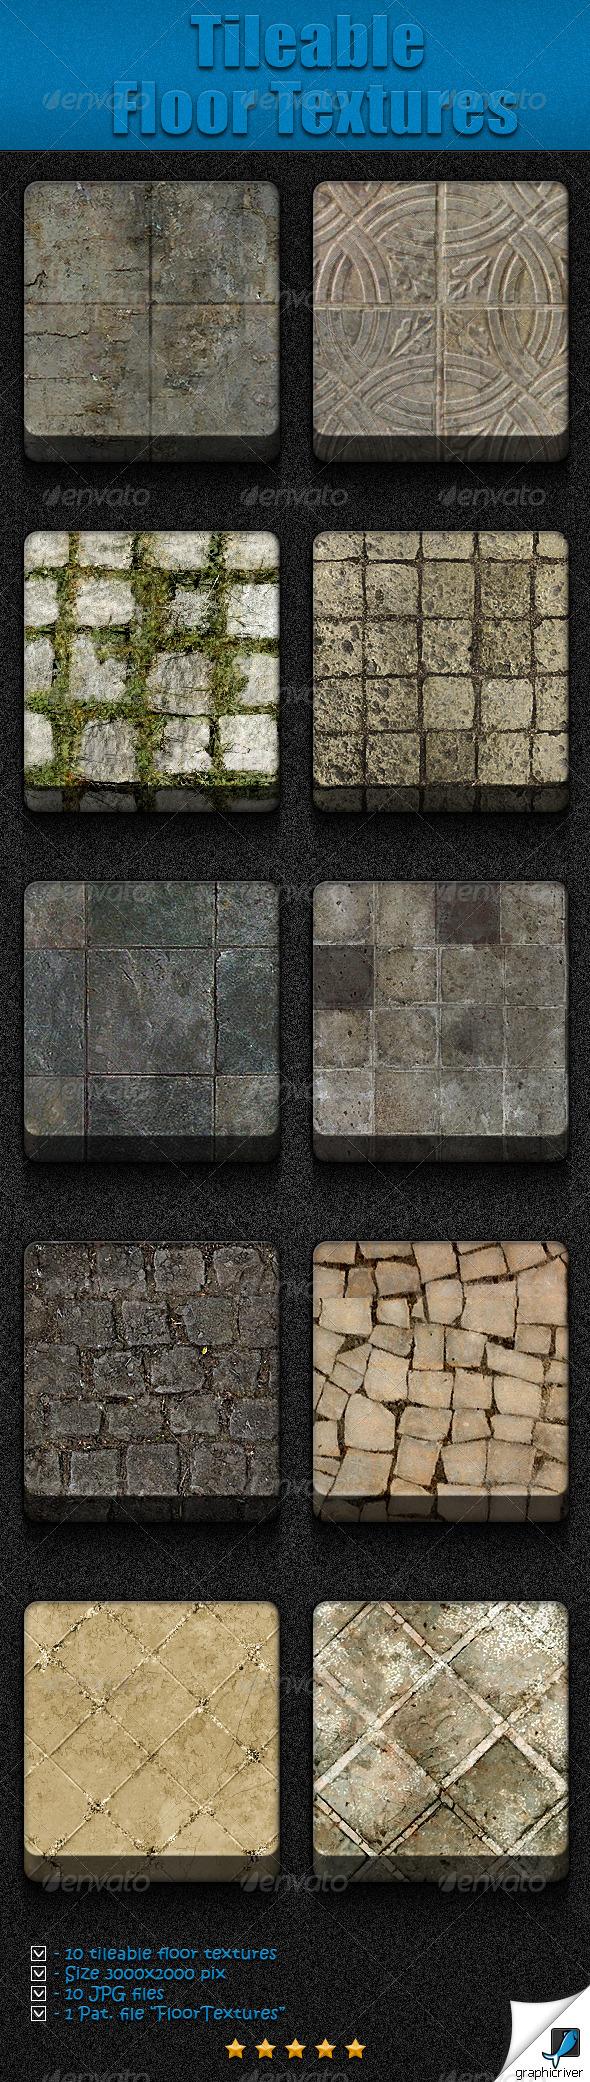 GraphicRiver Tileable Floor Textures 5159120